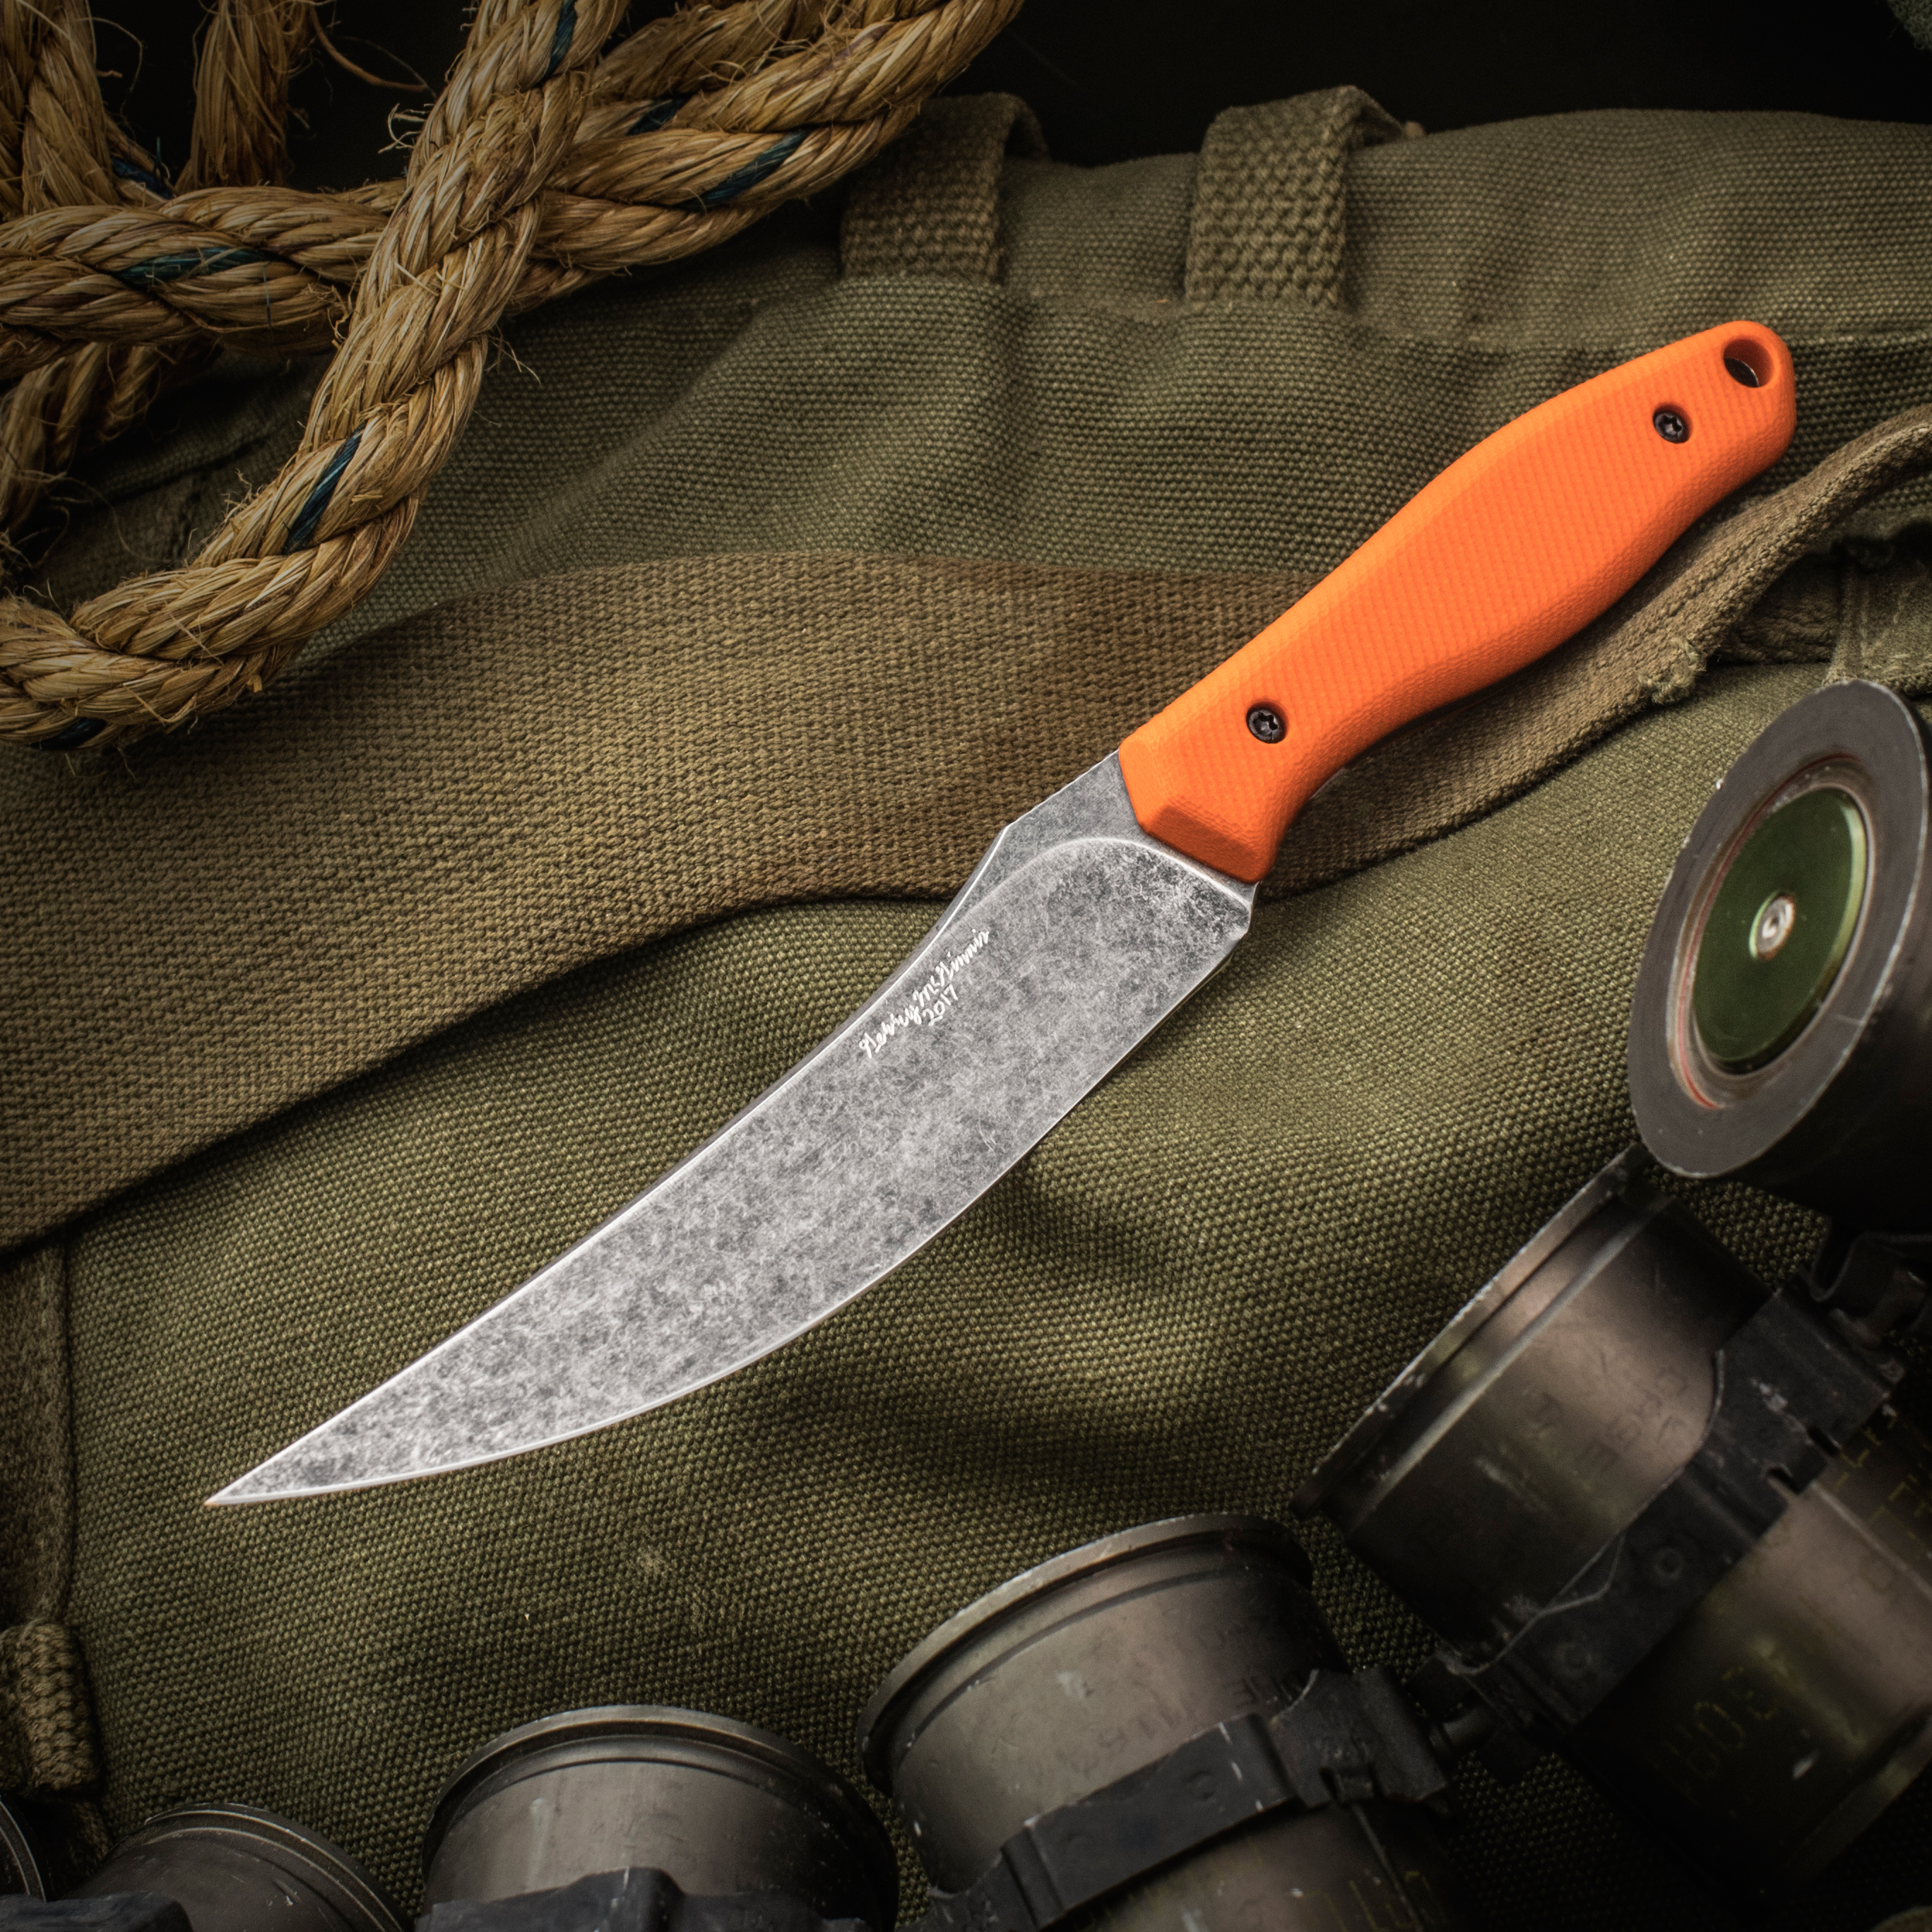 Gerry McGinnis Custom Skinner Fixed 4.5 inch CPM-154 Acid Washed Blade, Orange G10 Handles, No Sheath